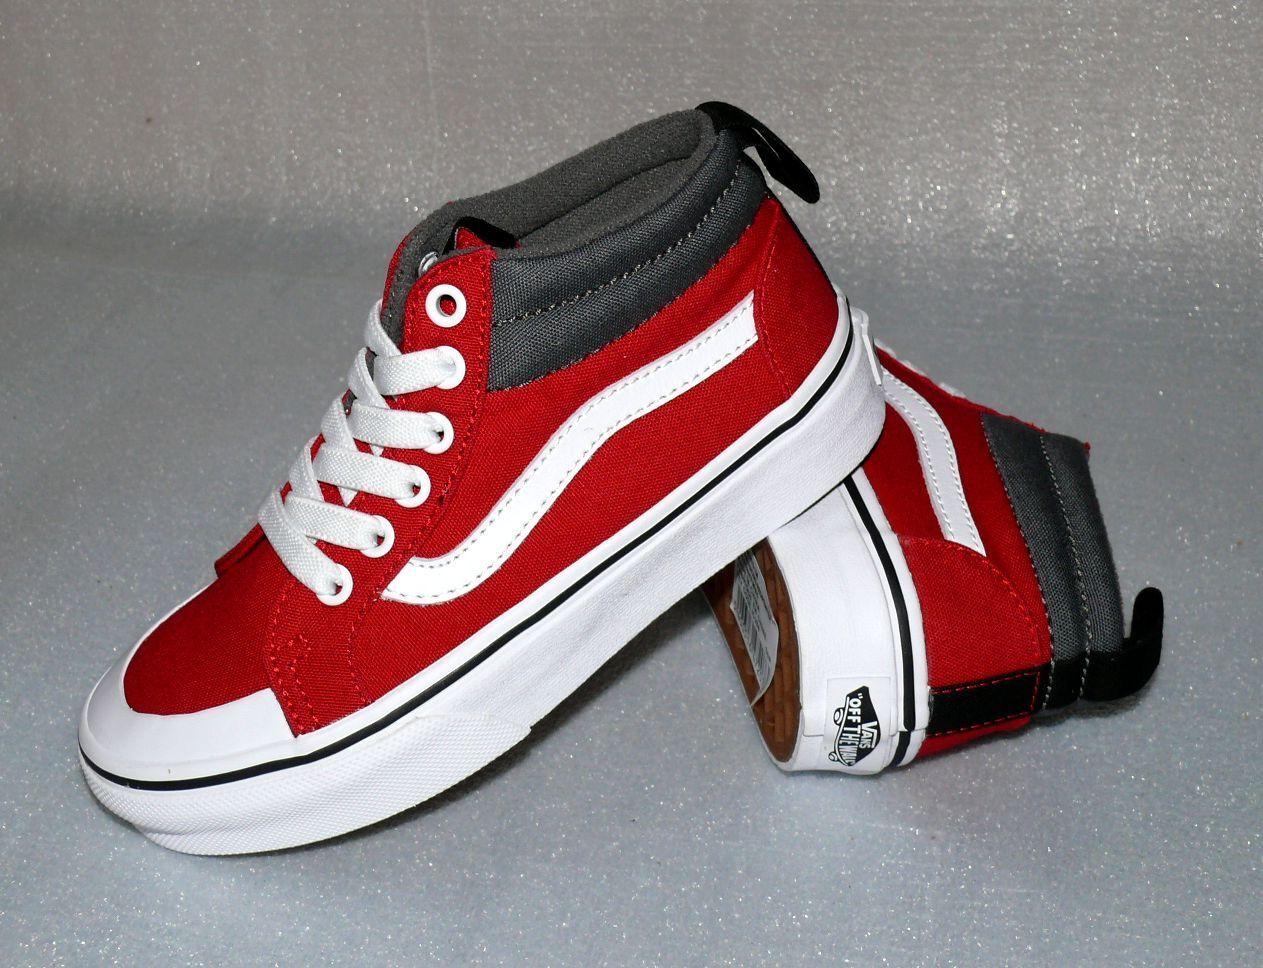 Vans Racer MID K'S Canvas Kinder Schuhe Sneaker EU 31 UK13 Racing Red White Pewt